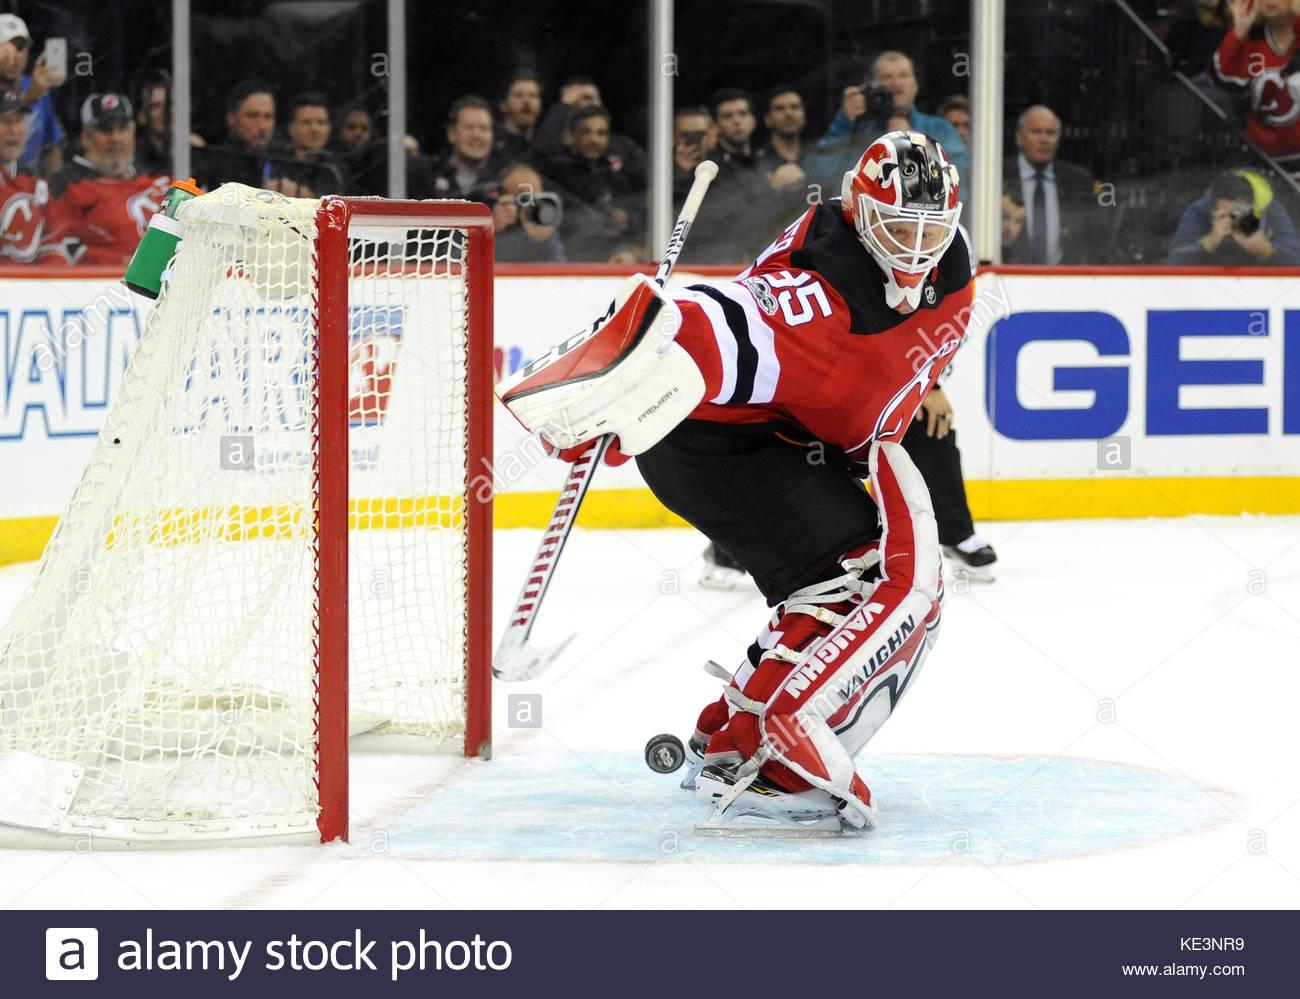 fbf9e9d10 Rangers NJ .com New Jersey Devils Goalie Cory ...